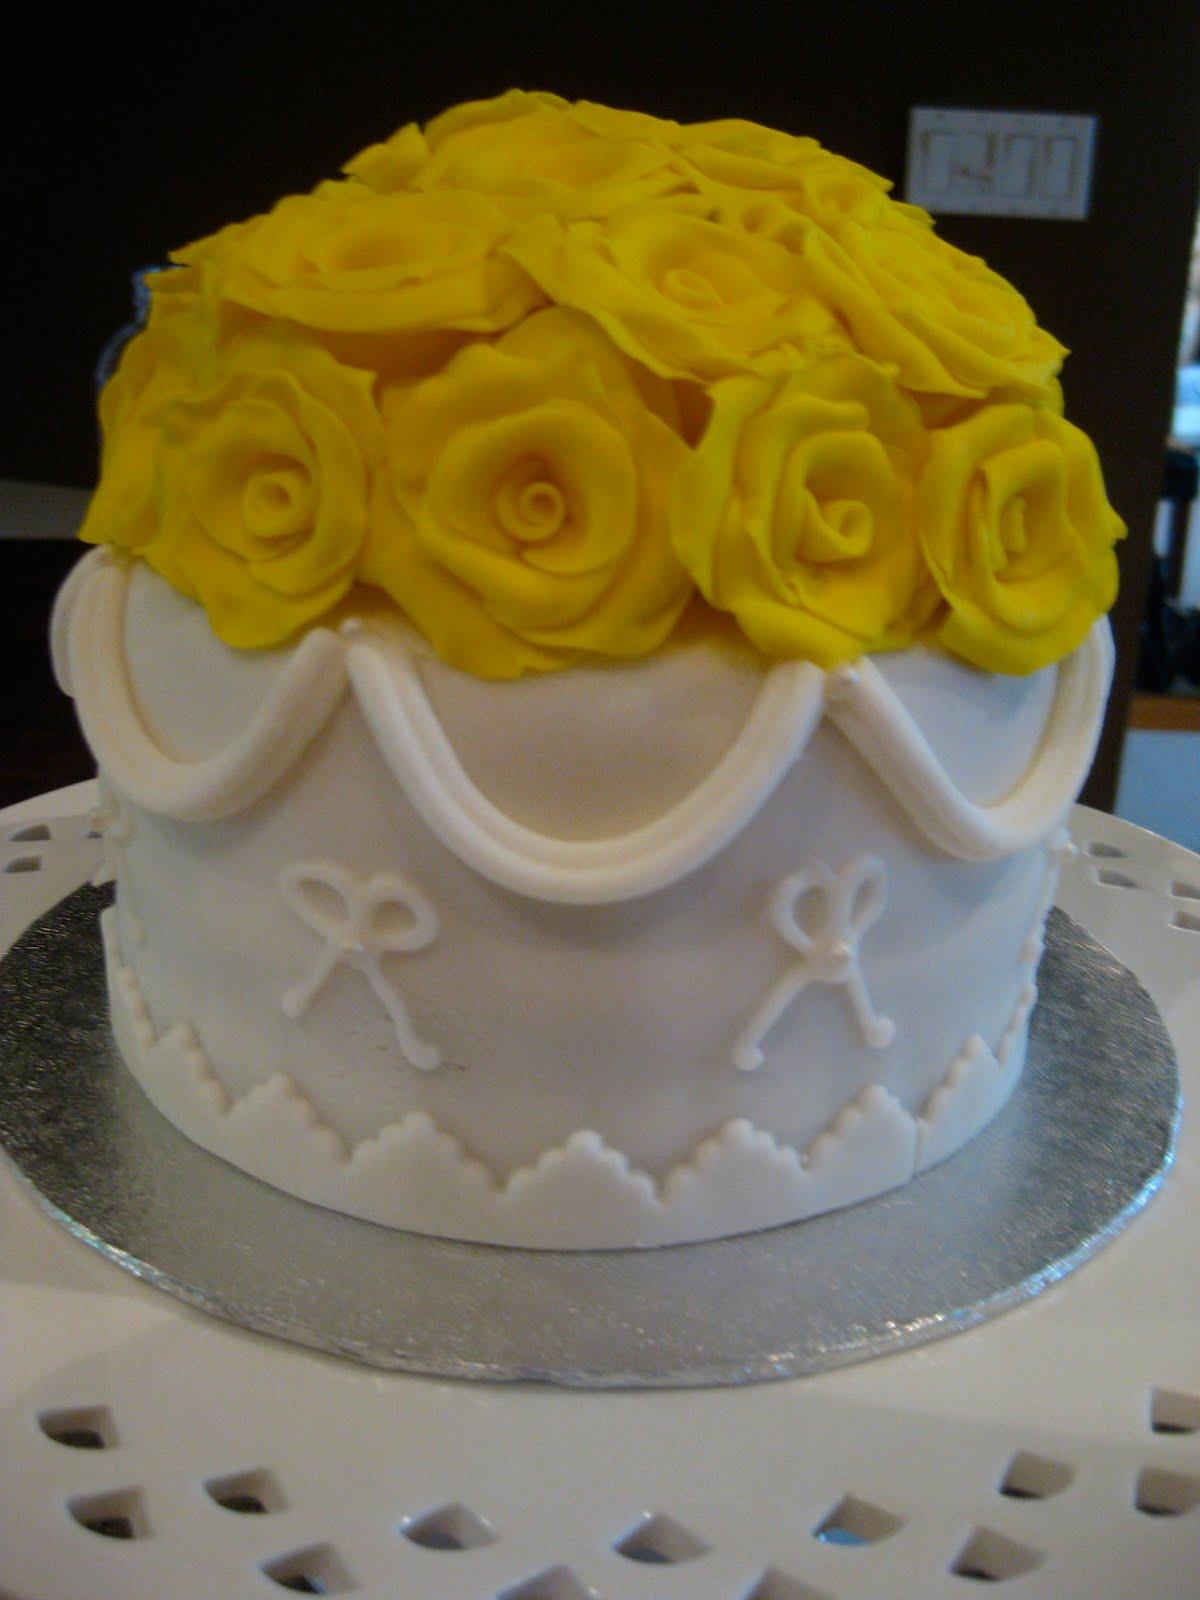 ROXIECAKES Vancouver 30th Anniversary Cake